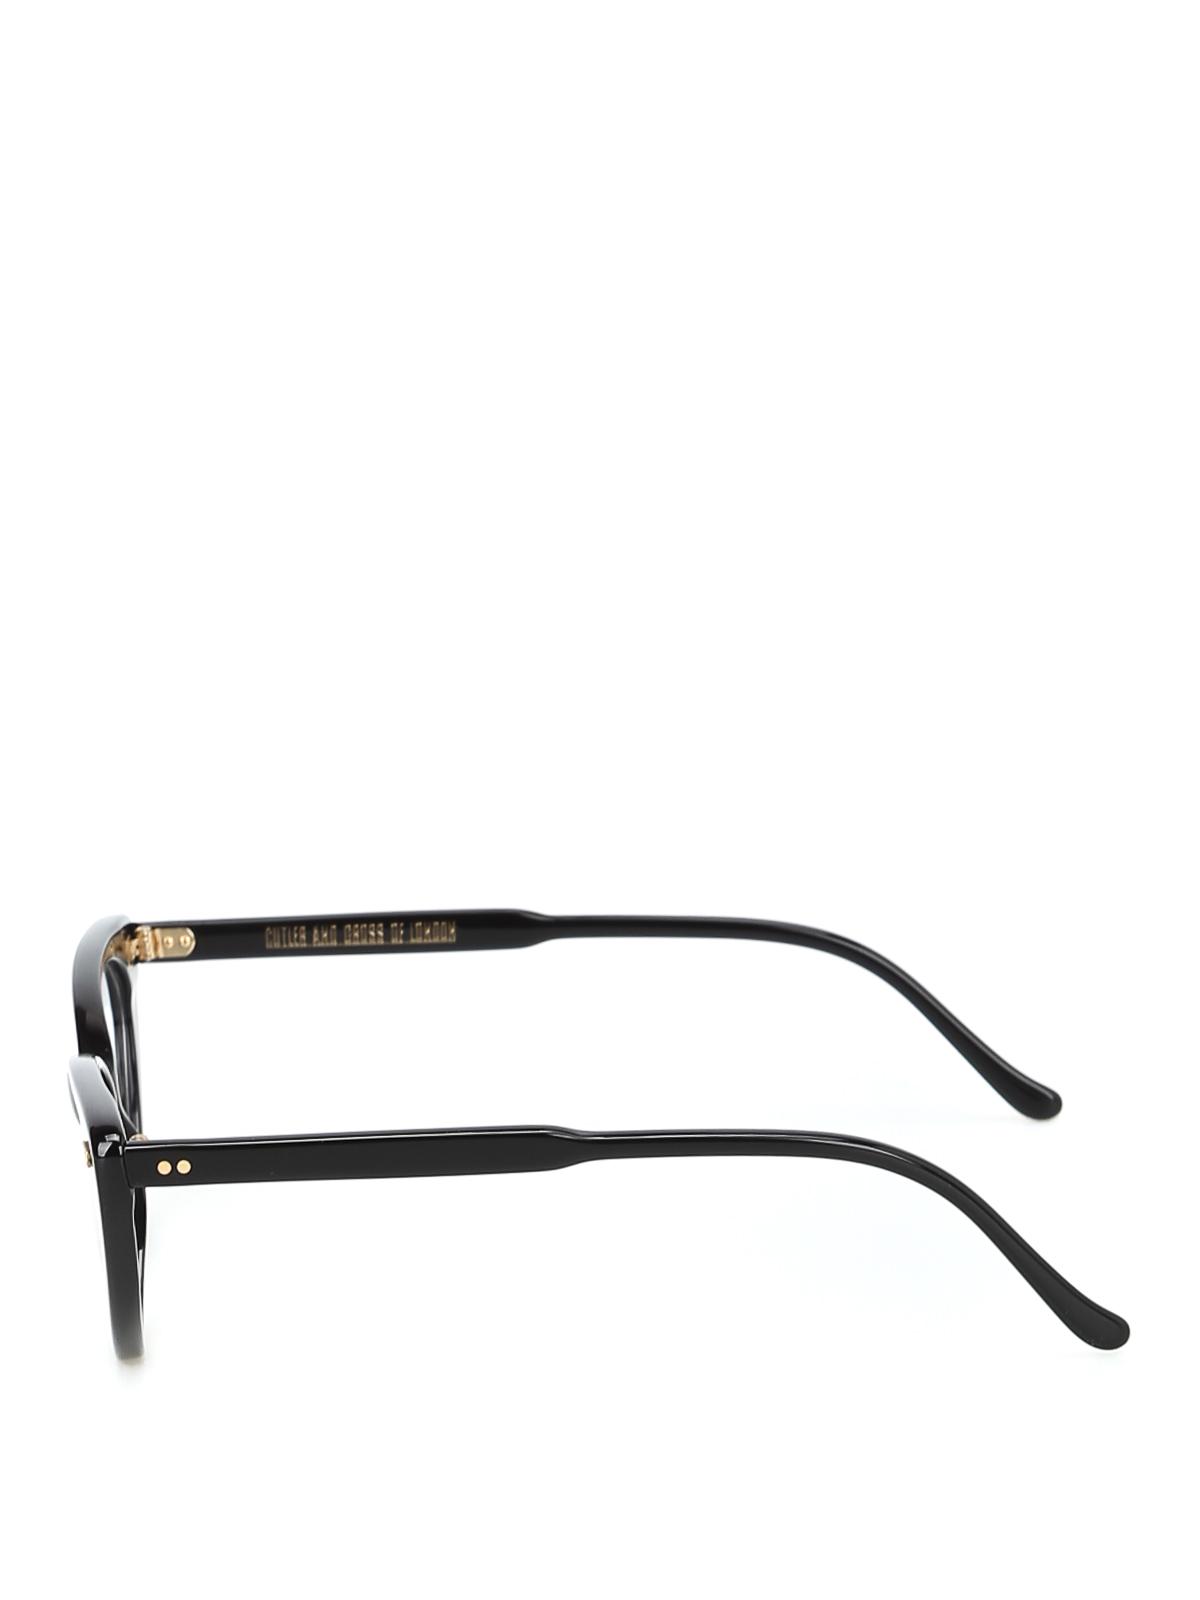 ca04b9ccce2 CUTLER AND GROSS  Glasses online - Super trendy black acetate cat-eye  glasses